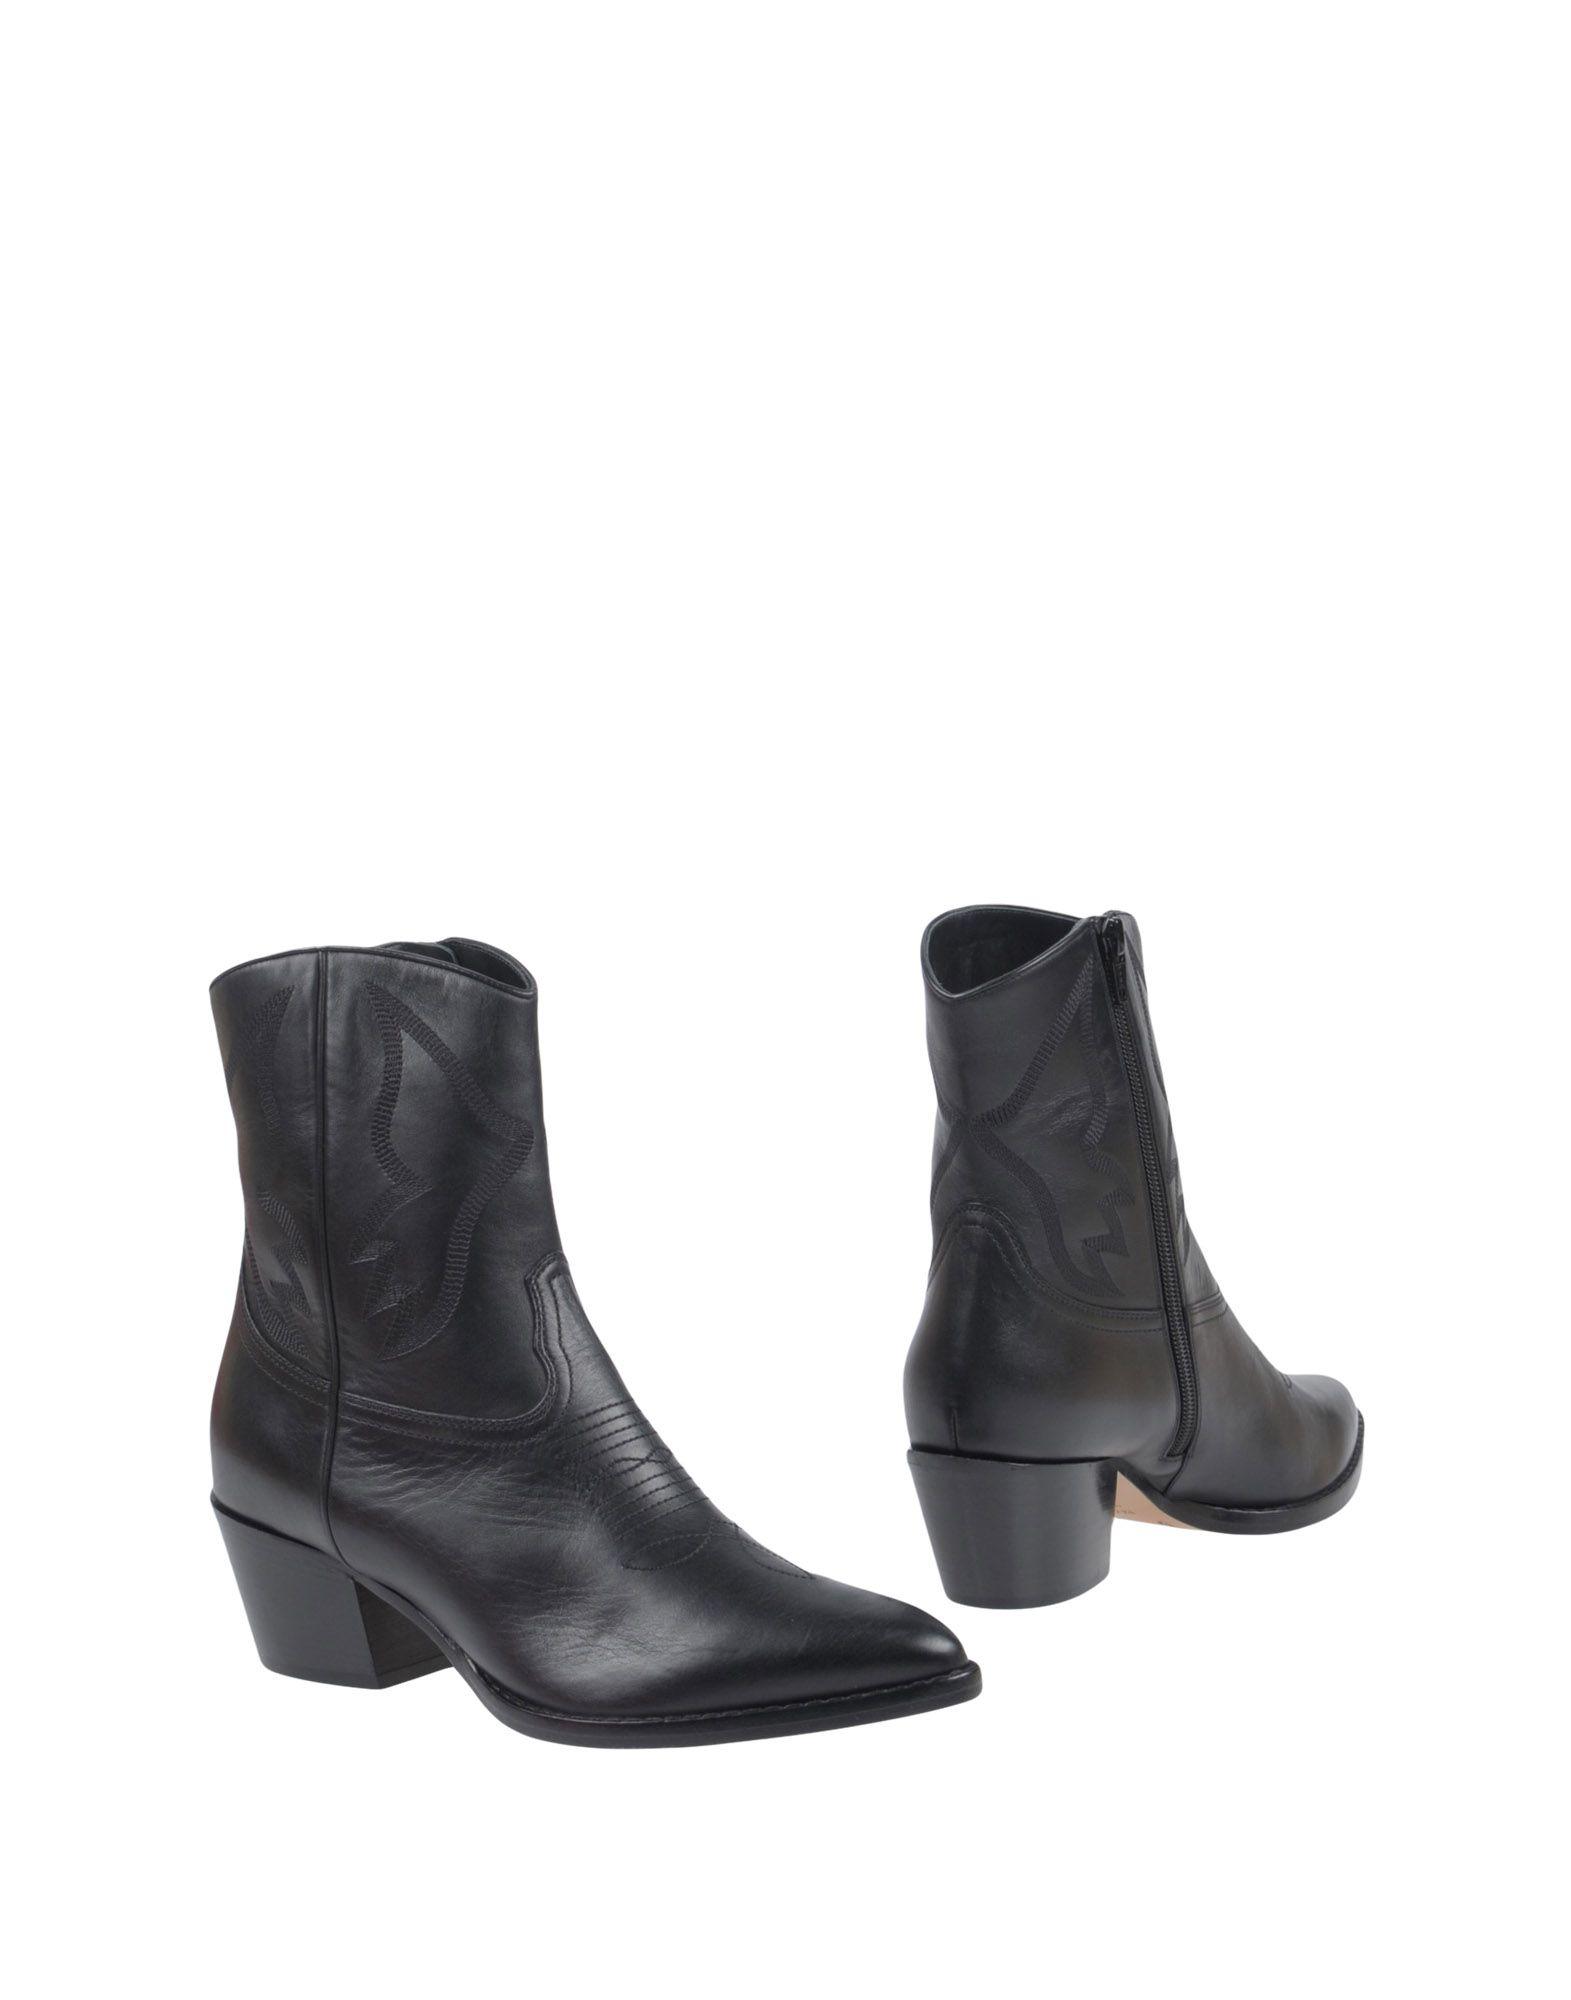 Valentino Garavani Ankle Boot - Boots Women Valentino Garavani Ankle Boots - online on  Australia - 11444466PQ 1a2a28